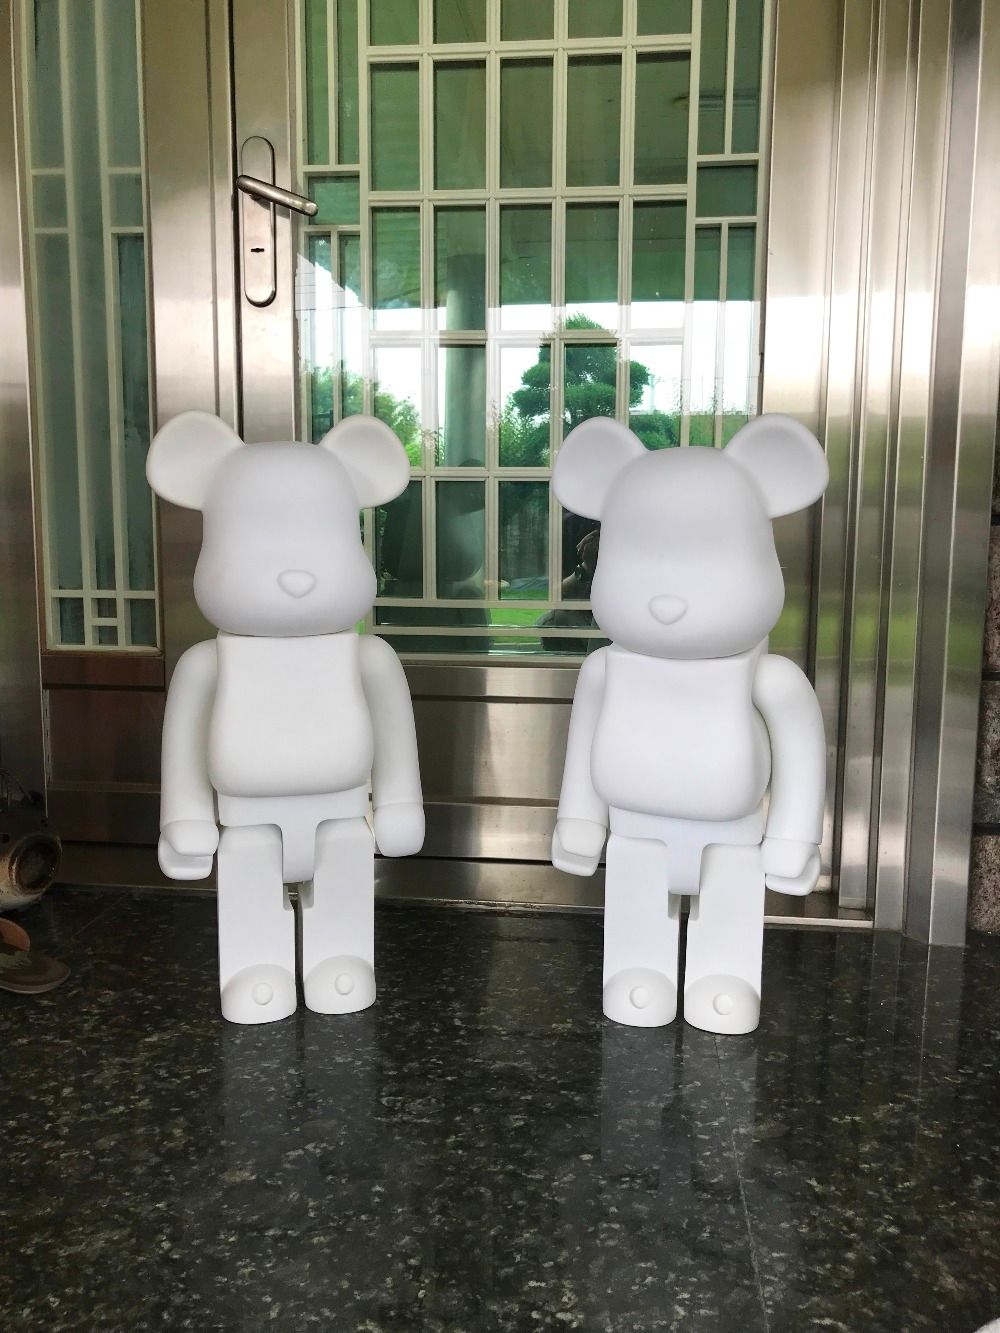 Limited Version 1000% bearbrick bear@brick 70cm DIY Paint PVC Action Figure White Color With Opp Bag